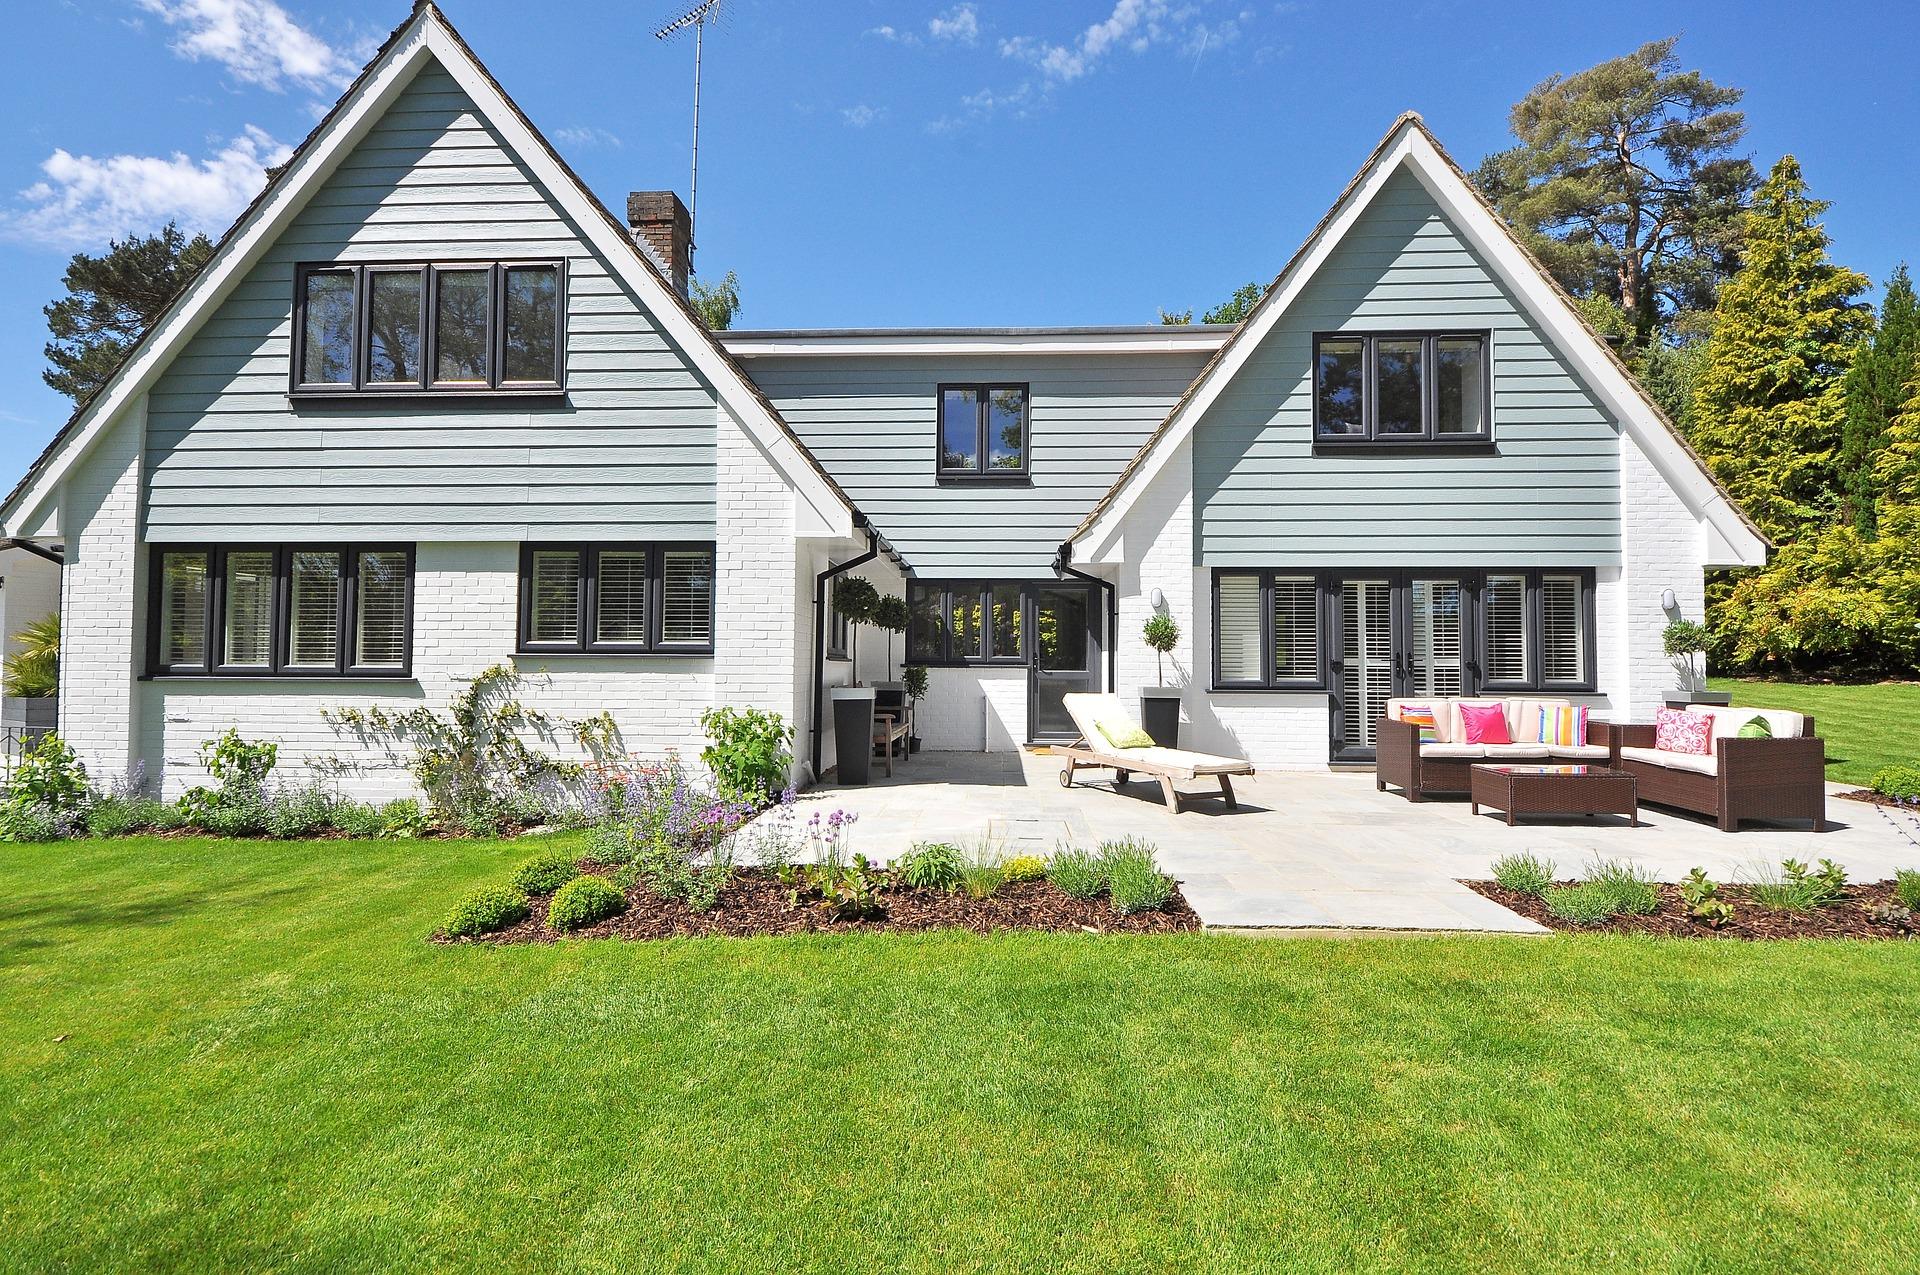 new-england-style-house-2826065_1920.jpg